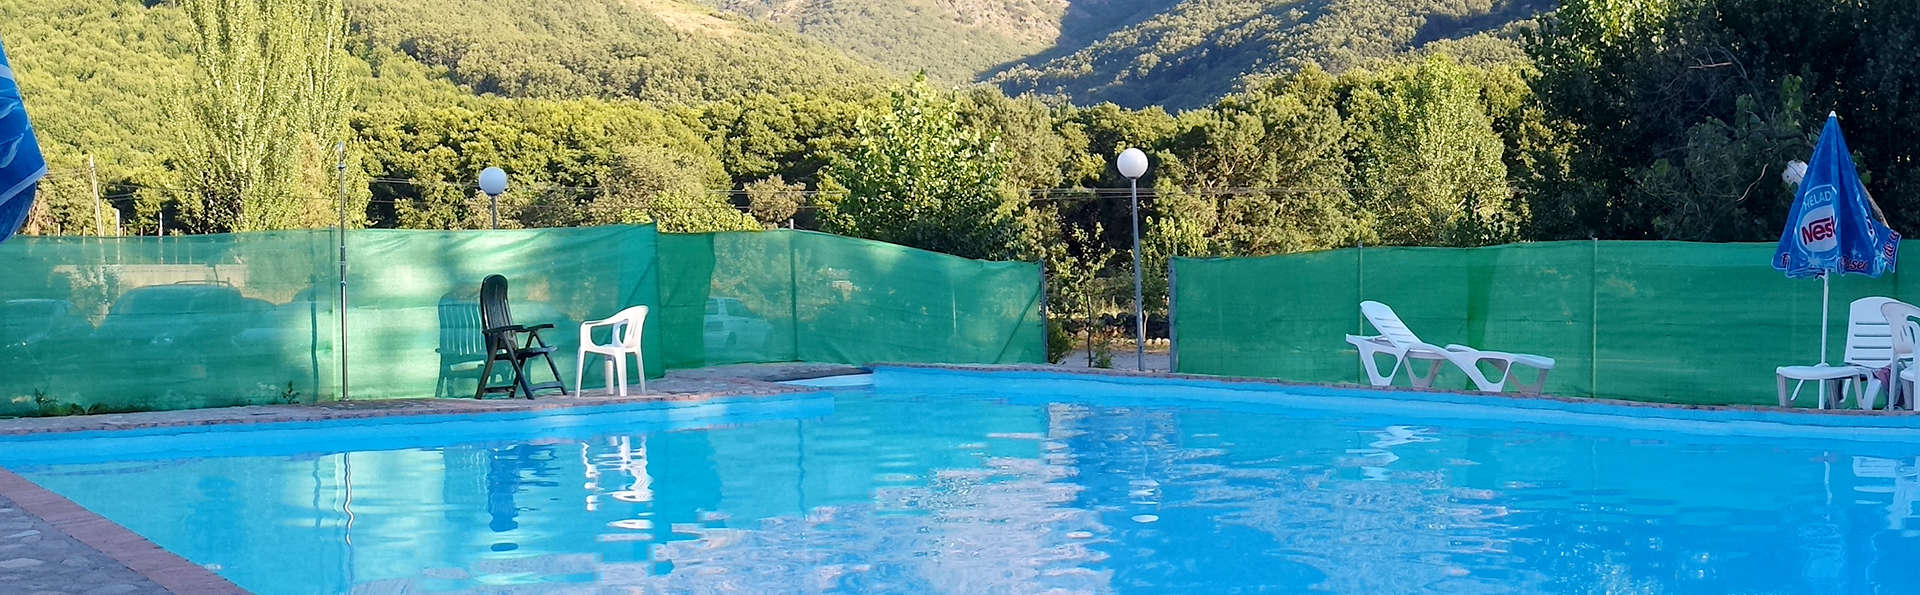 Hotel Valle del Jerte Los Arenales - EDIT_NEW_Pool2.jpg